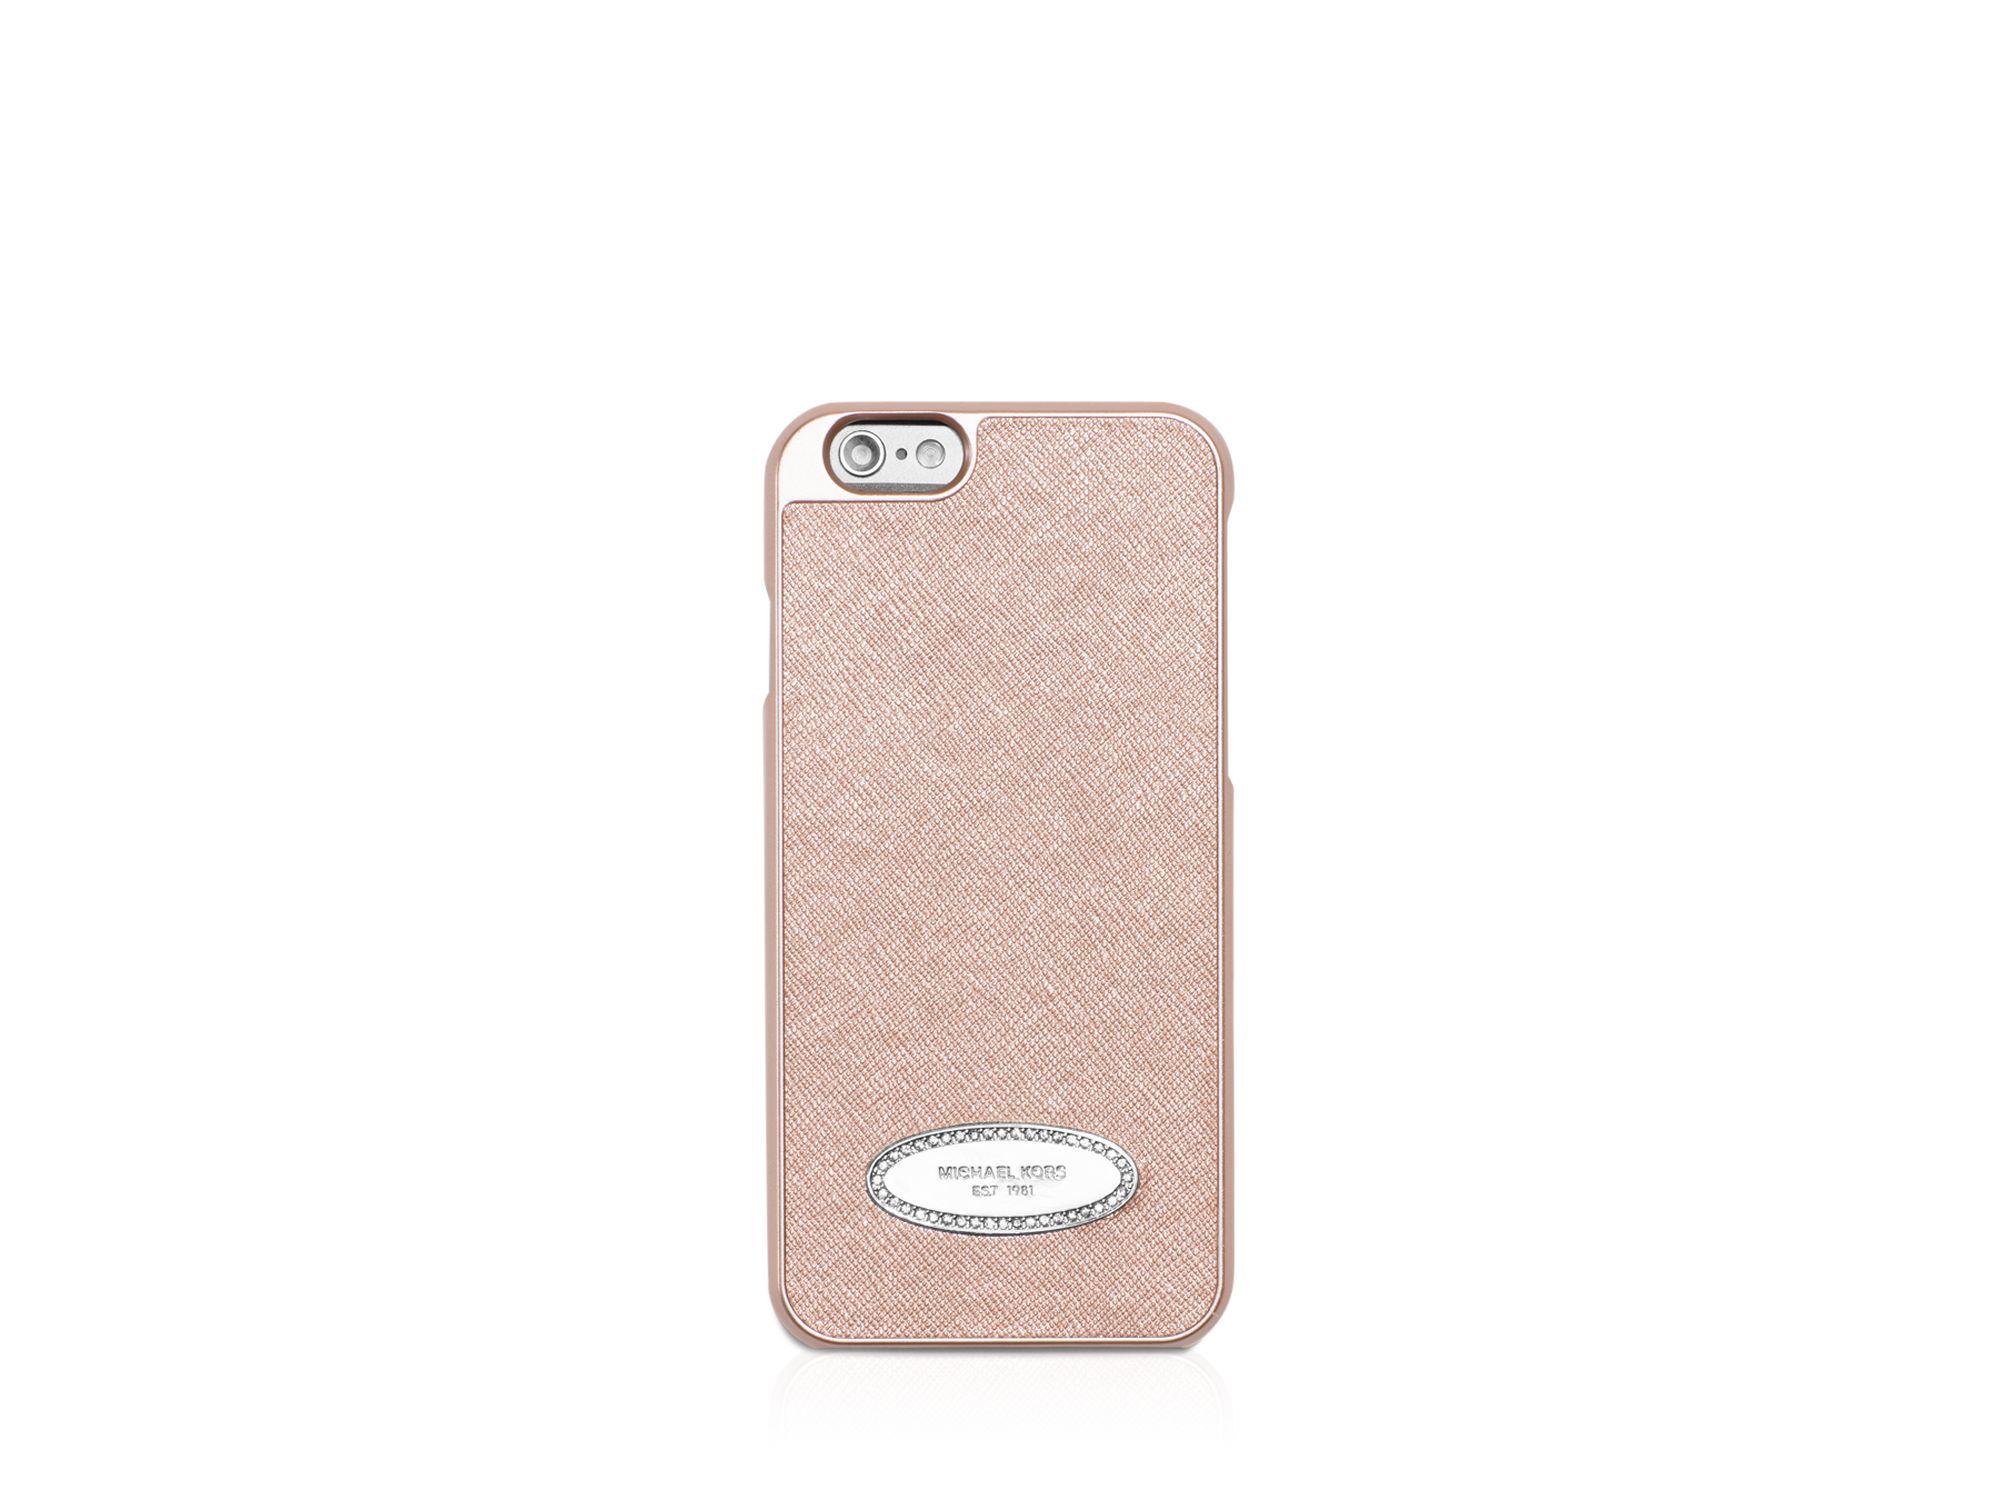 michael kors iphone 6 case